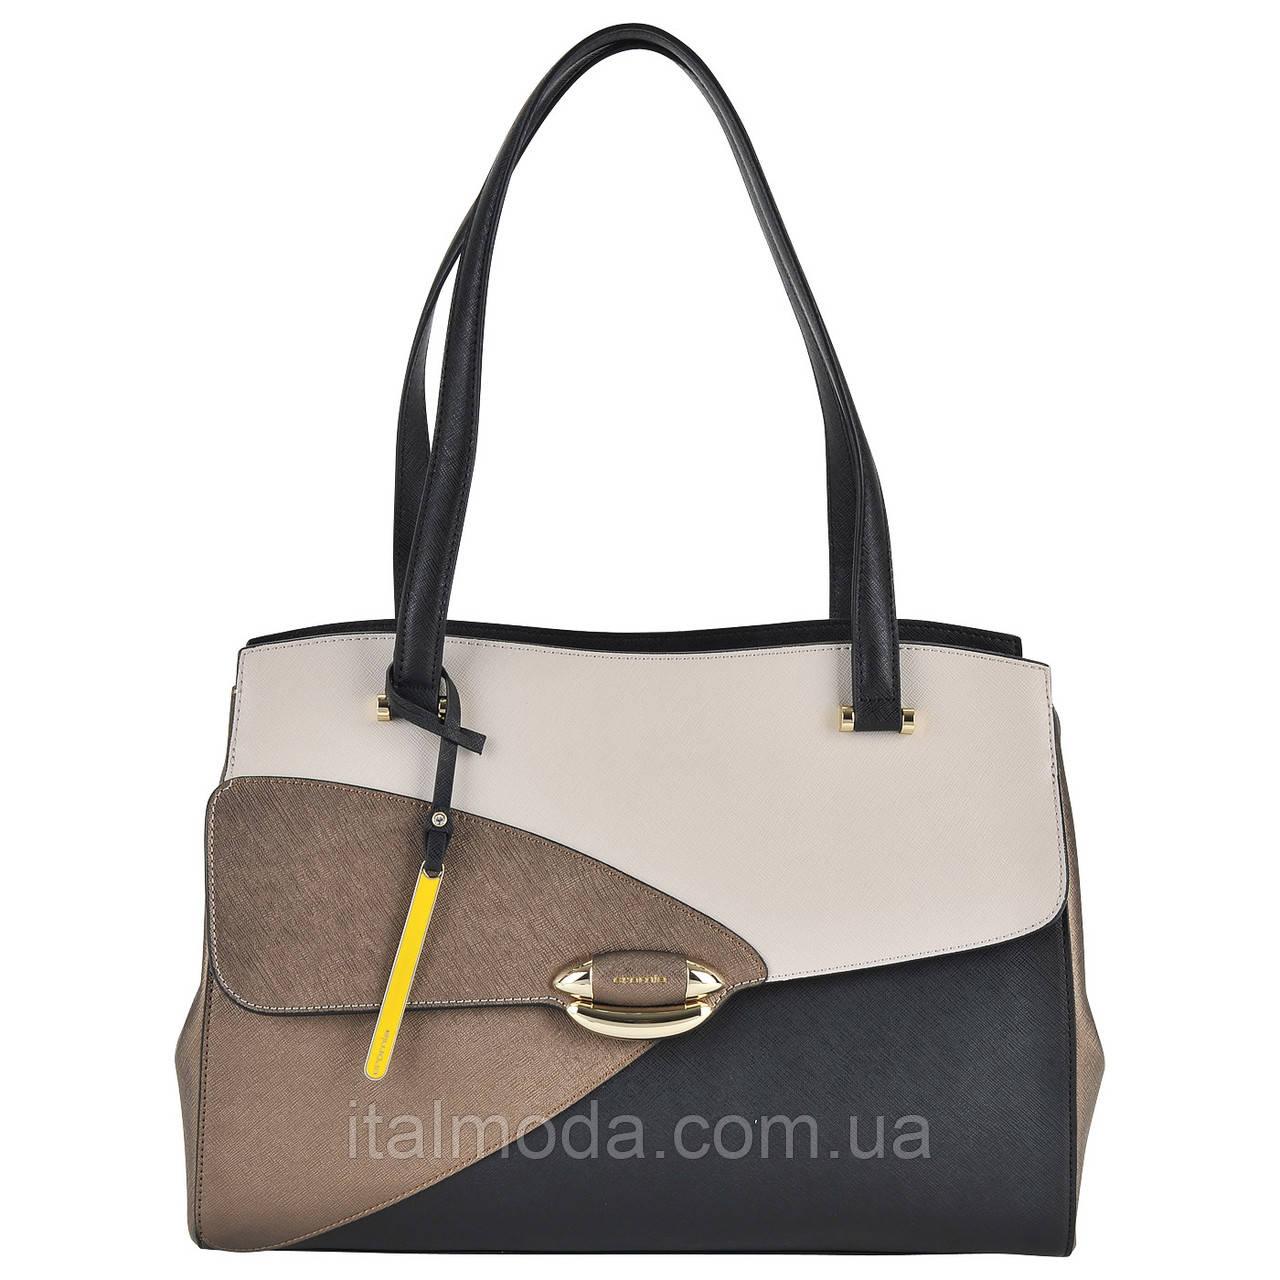 5530a016dd44 Женская сумка Cromia (Кромия) 1403440 - Интернет-магазин